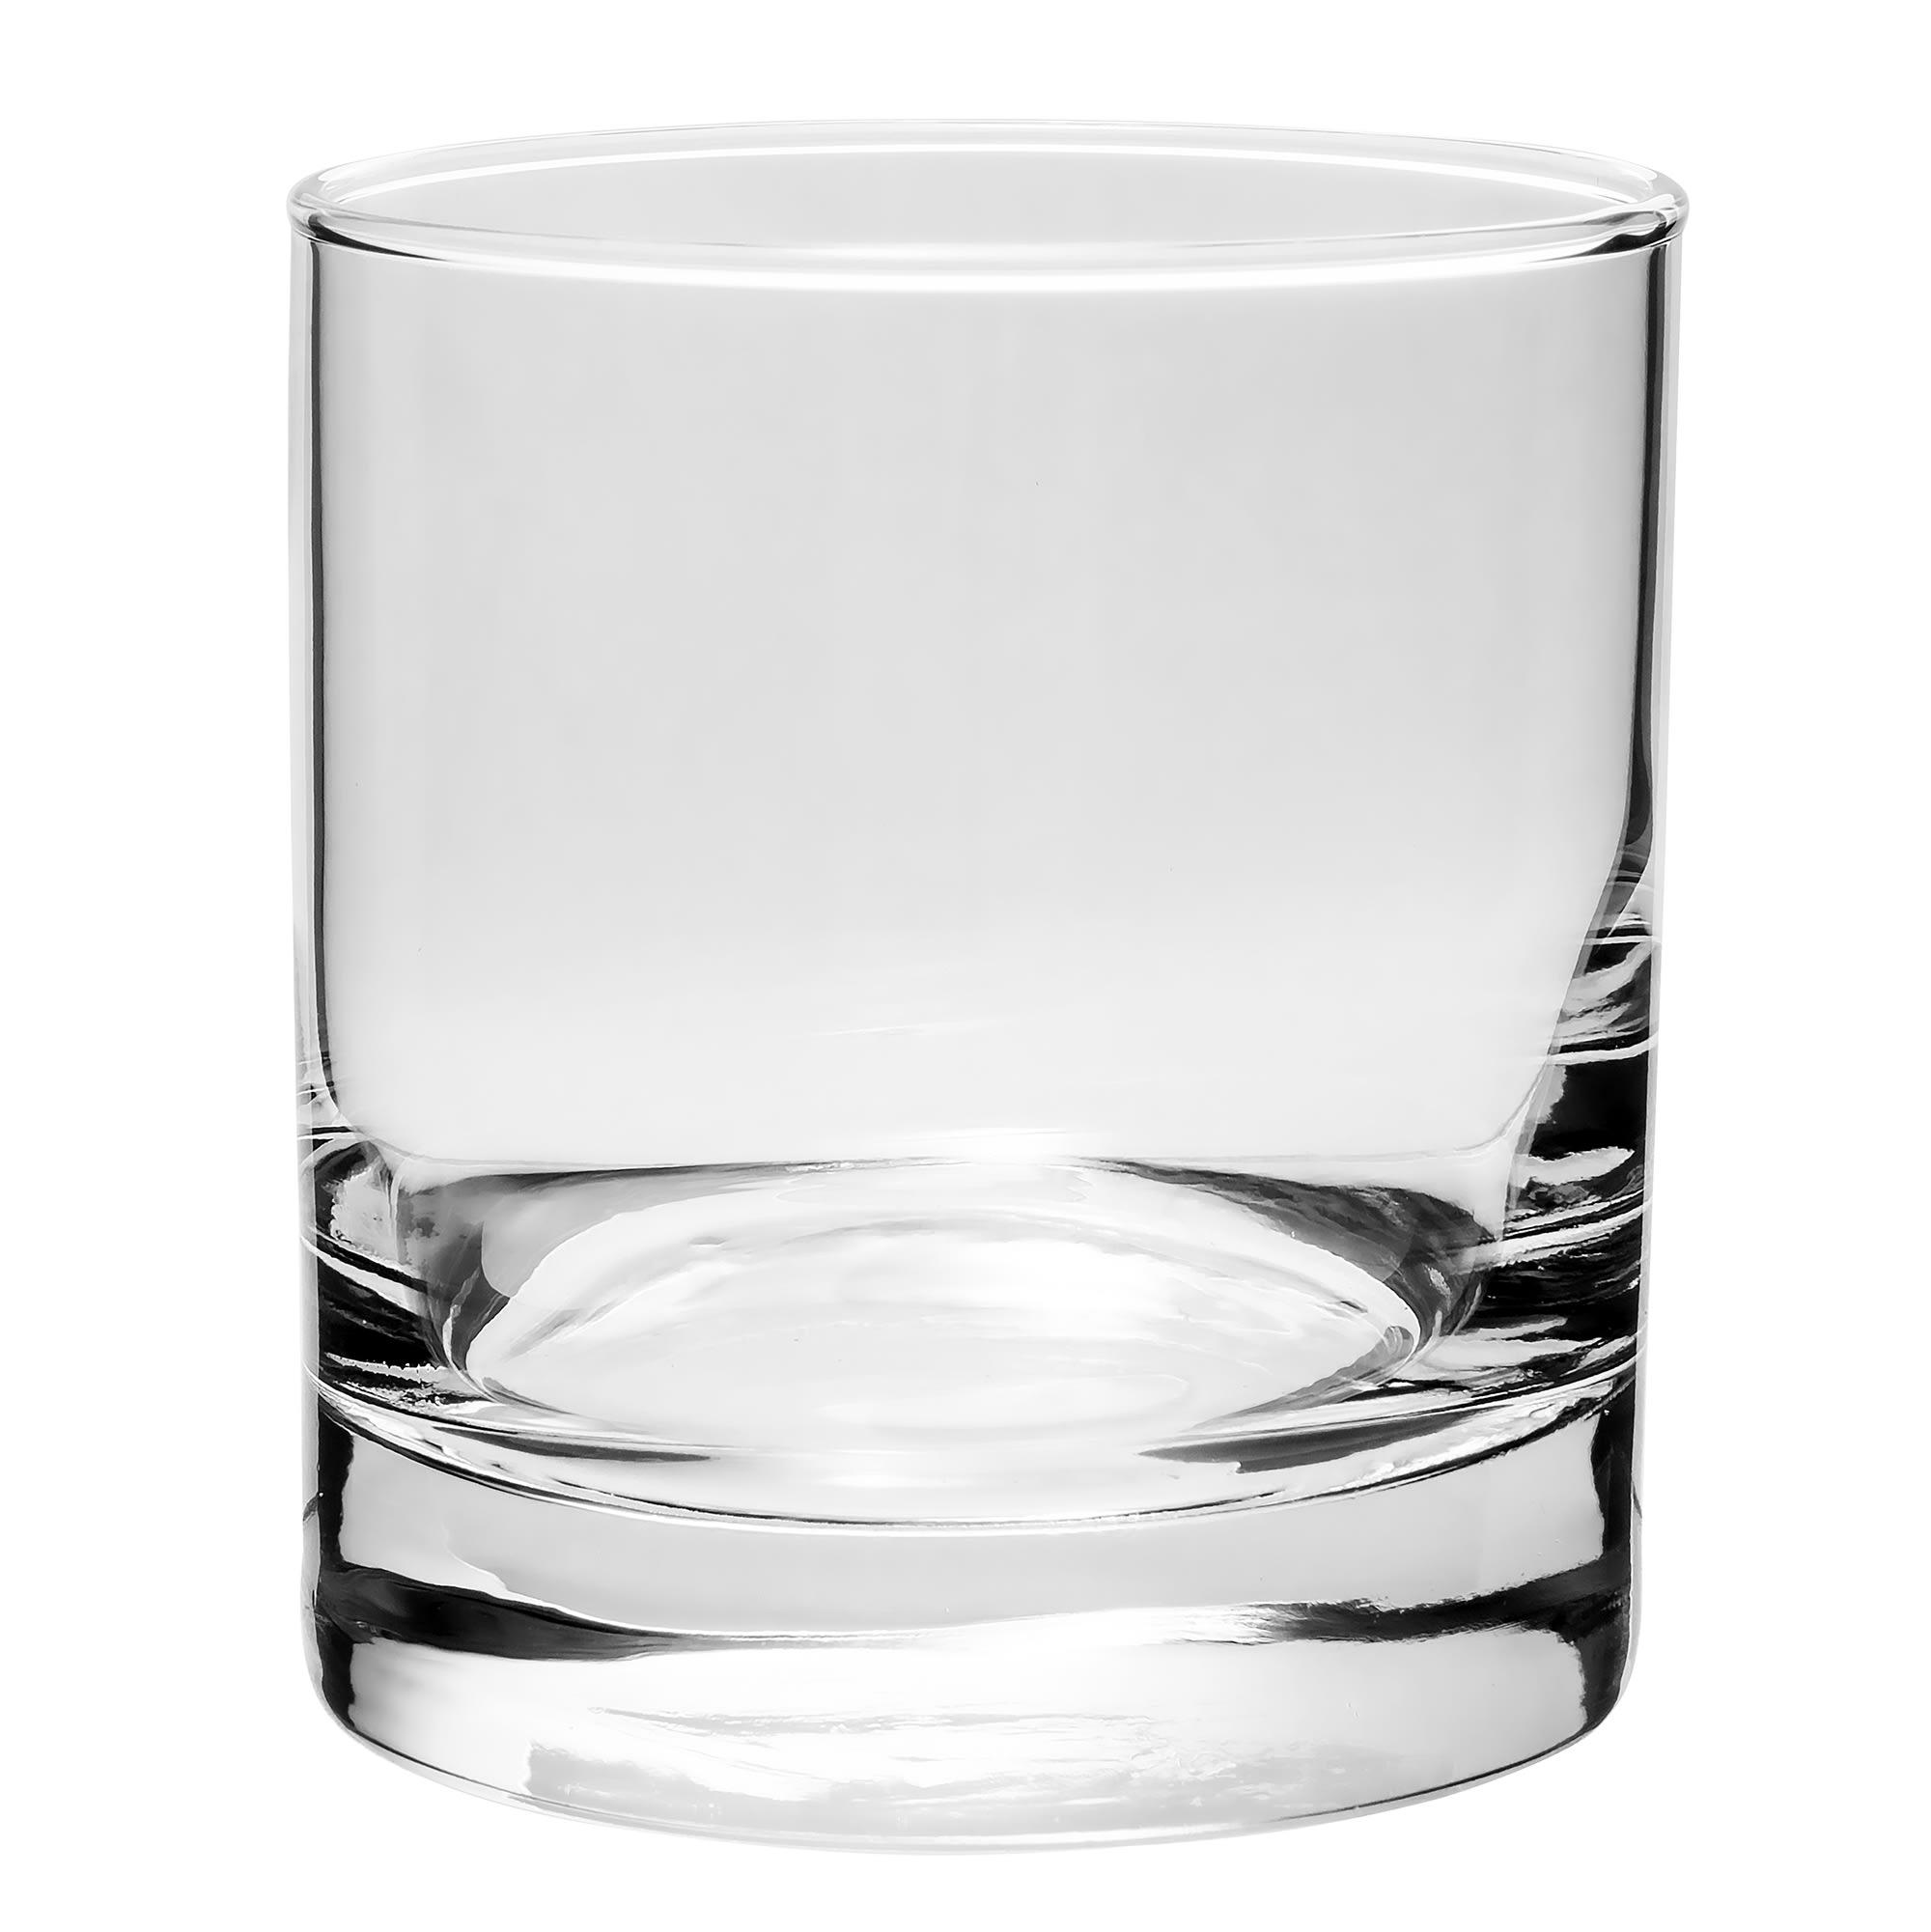 Libbey 916CD 8 oz Heavy Base Rocks Glass - Finedge